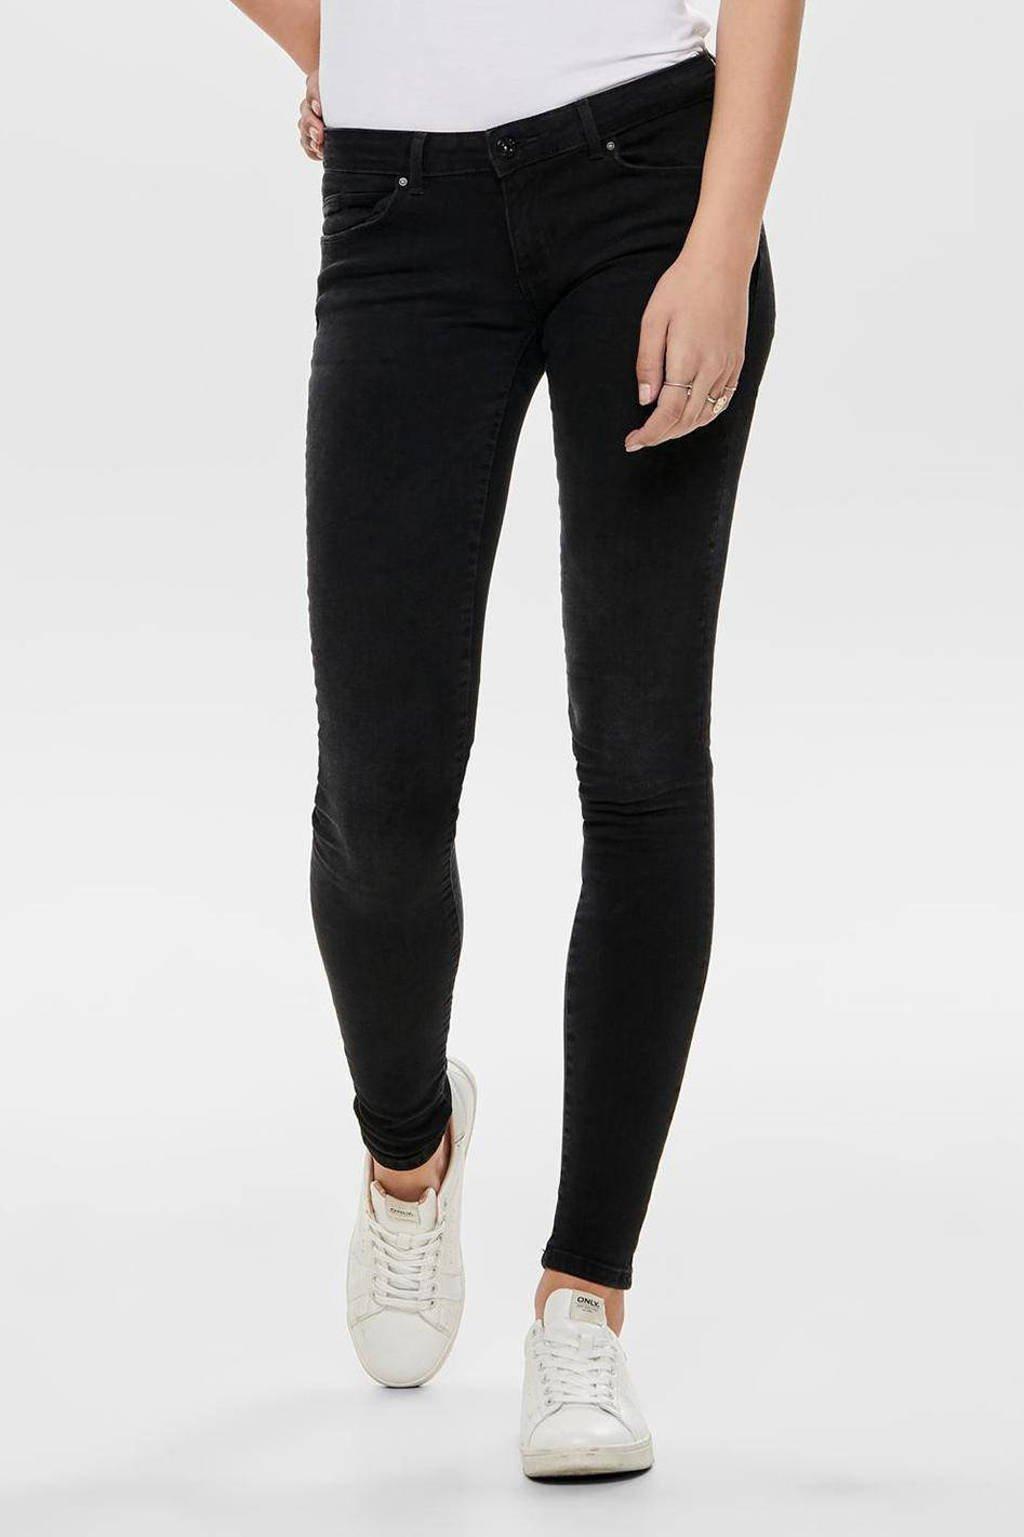 ONLY extra low waist skinny jeans ONLCORAL denim black, Denim black